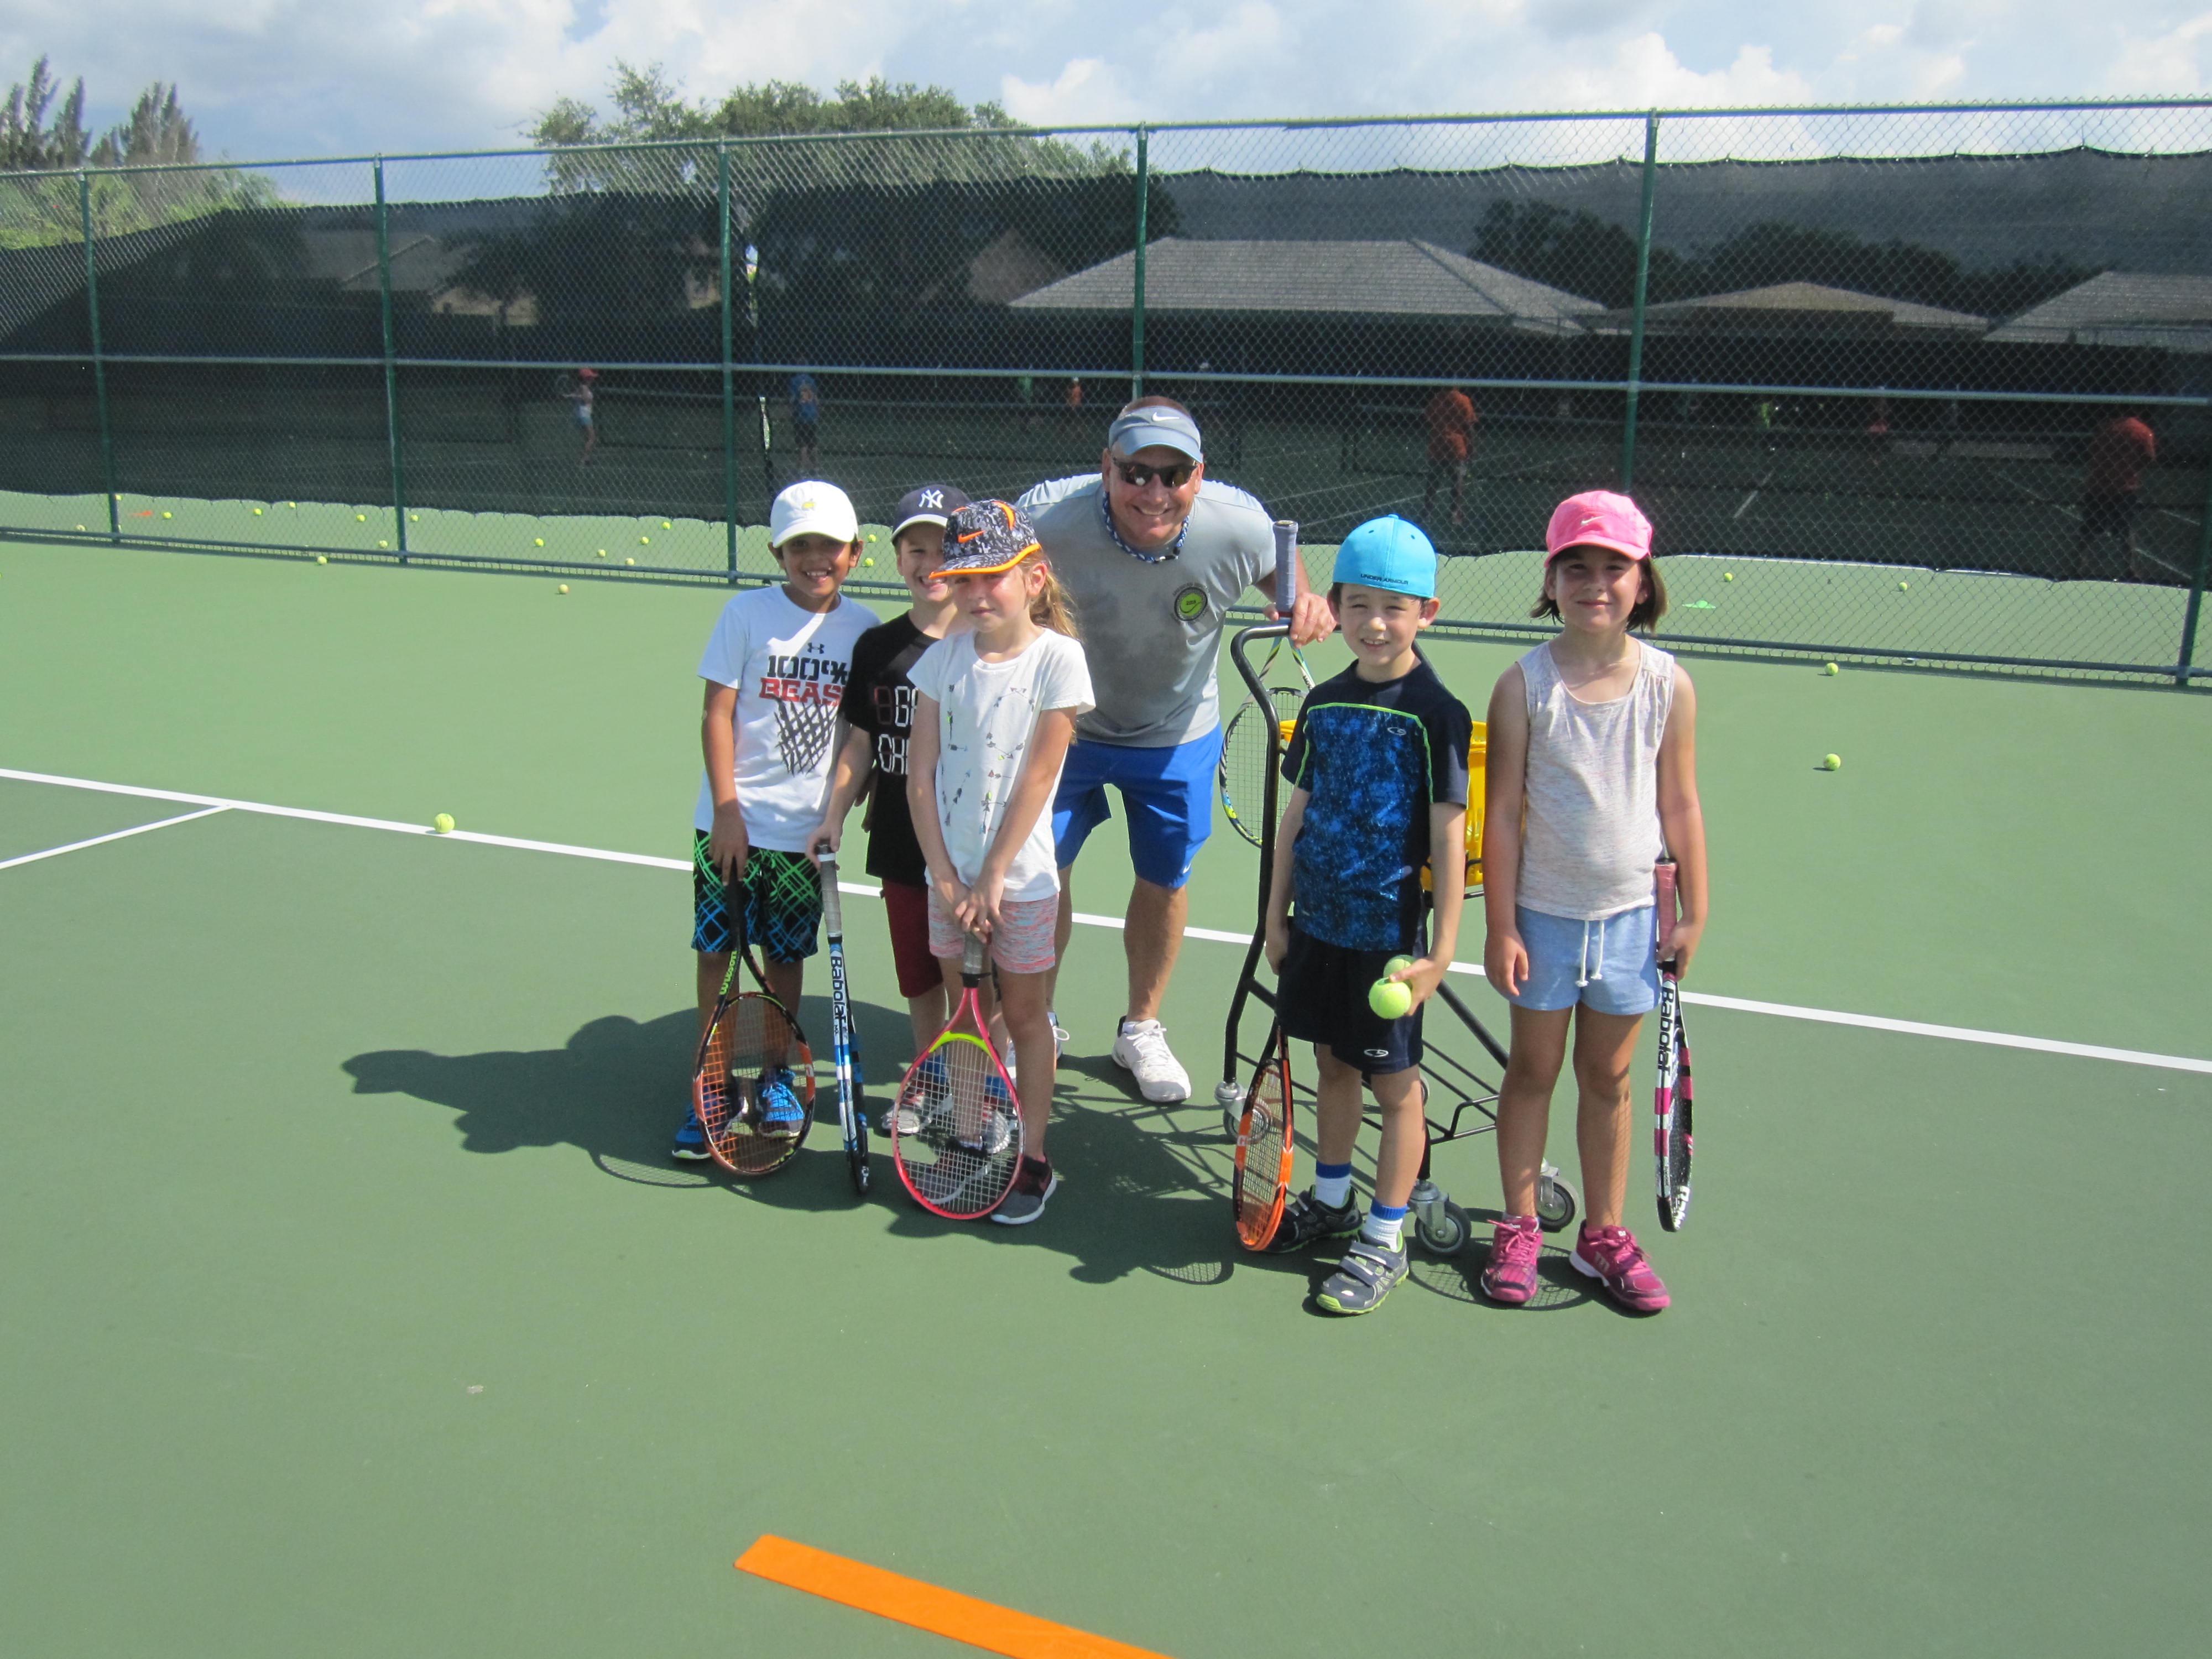 American Heritage tennis camp